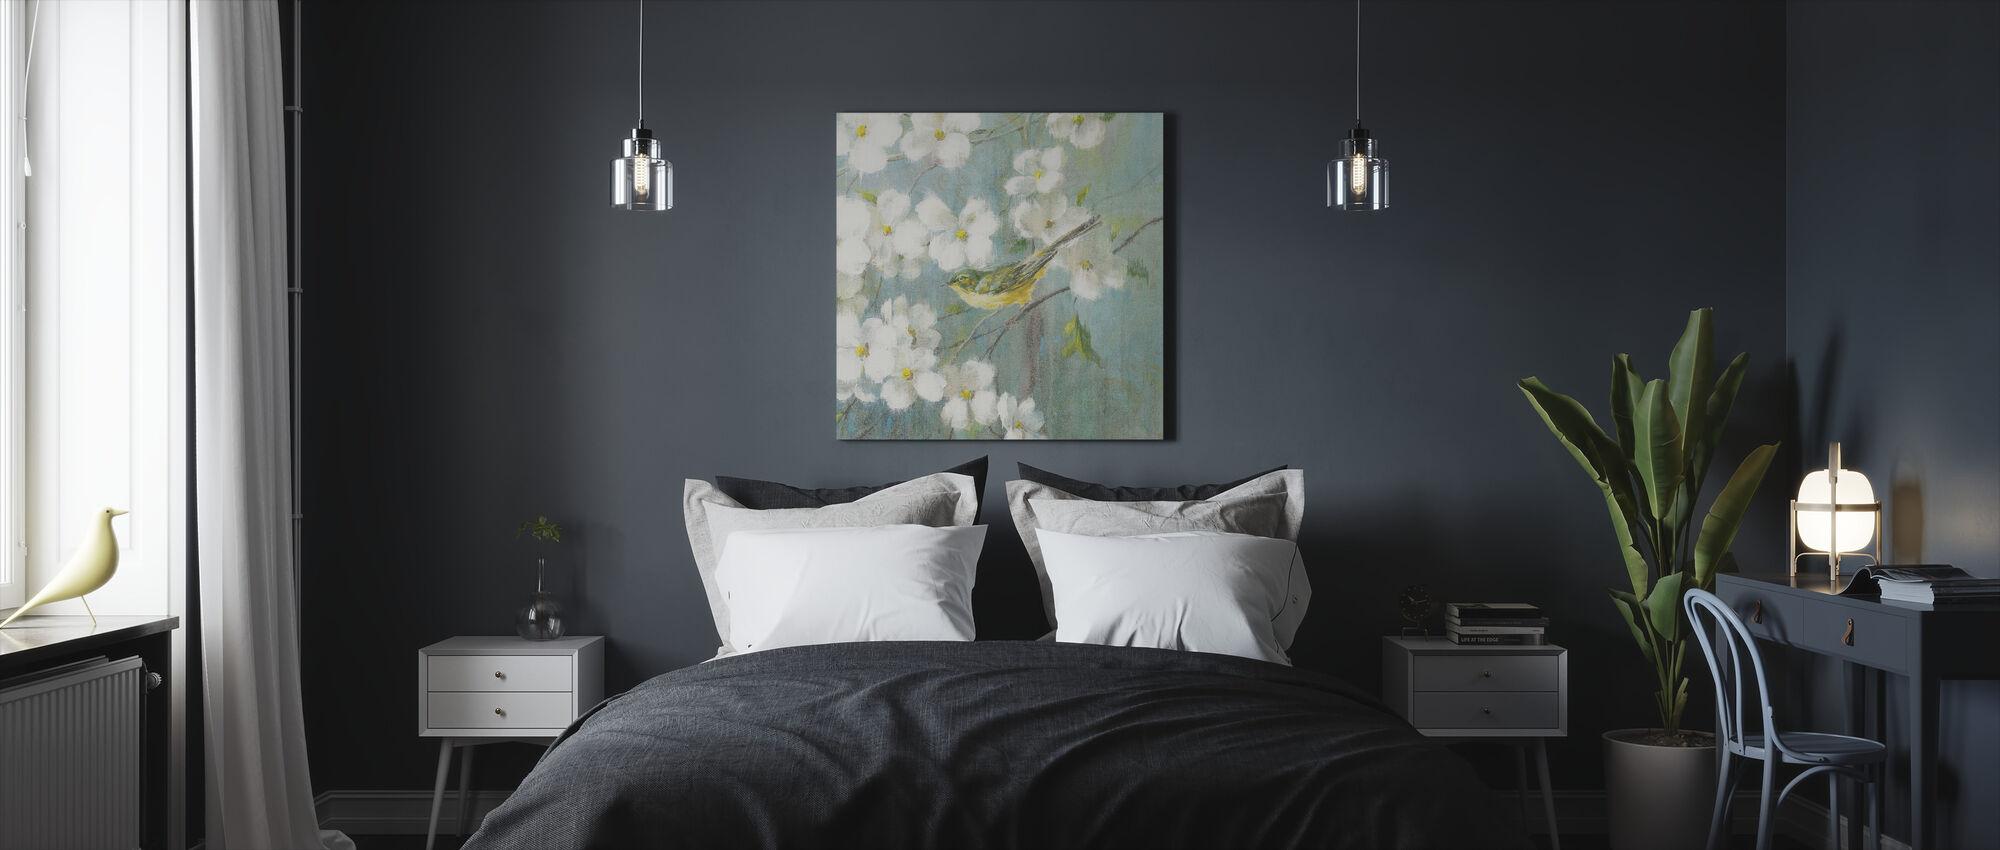 Spring Dream 4 - Canvas print - Bedroom